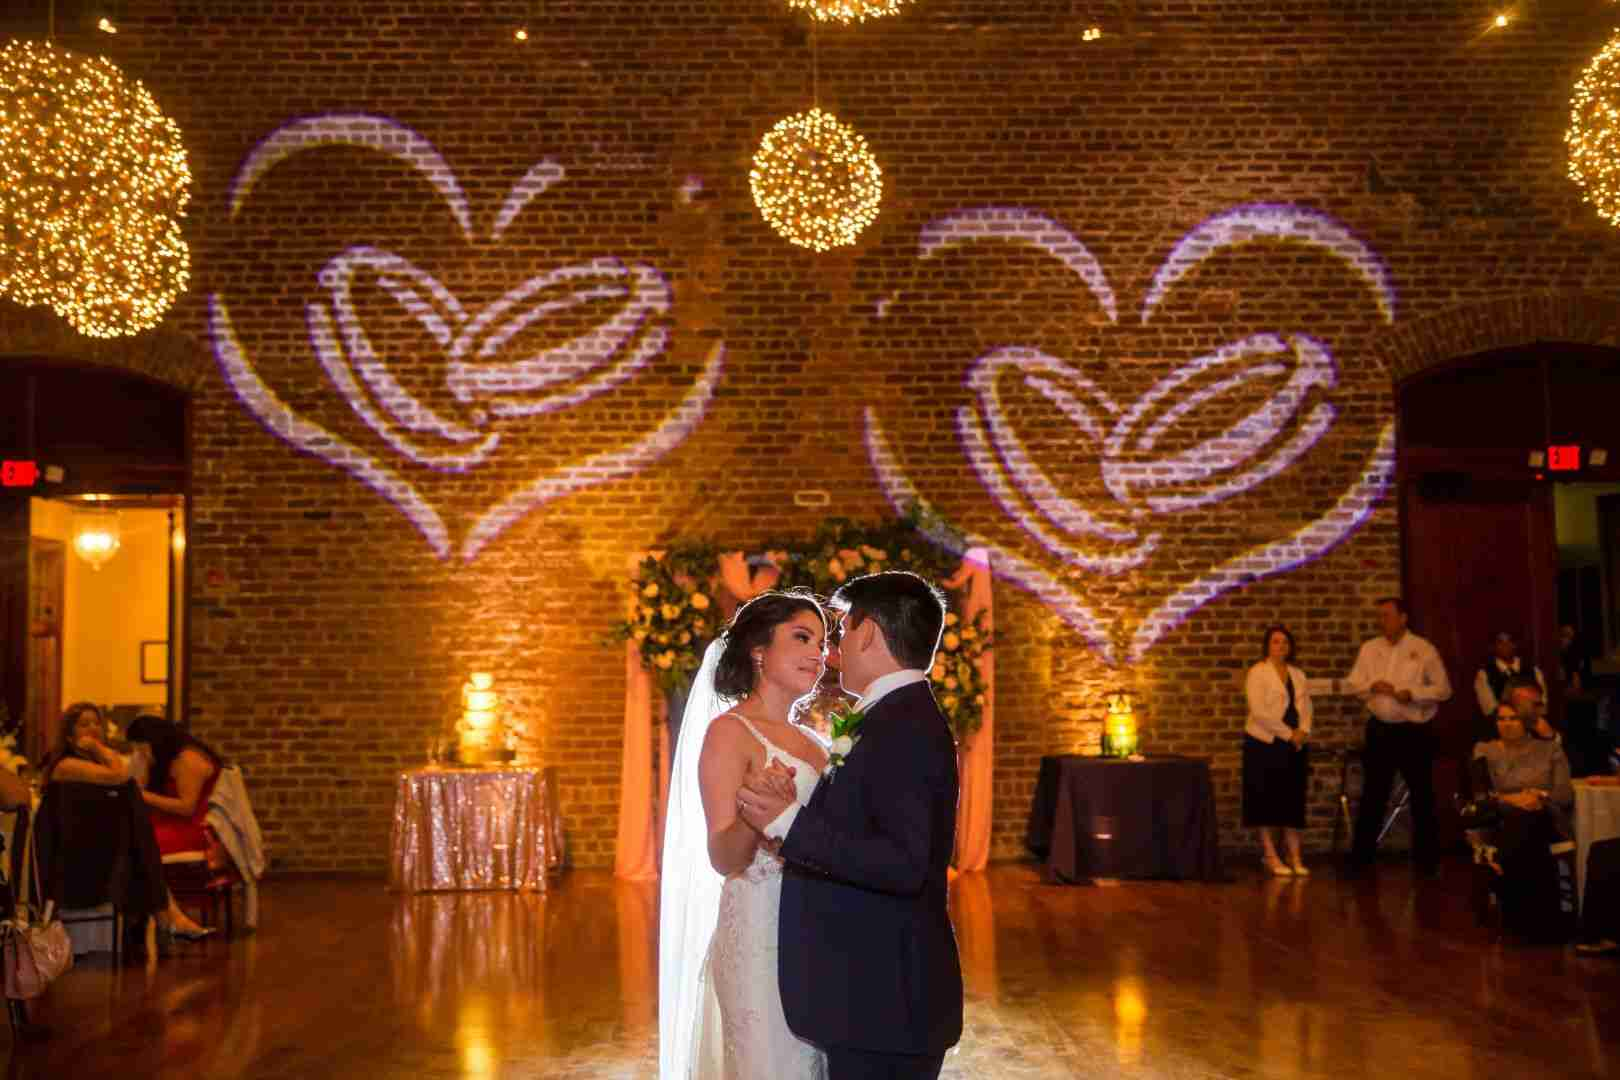 Savannah mobile DJ-service_Wedding Couples First Dance at Charles H Morris Center